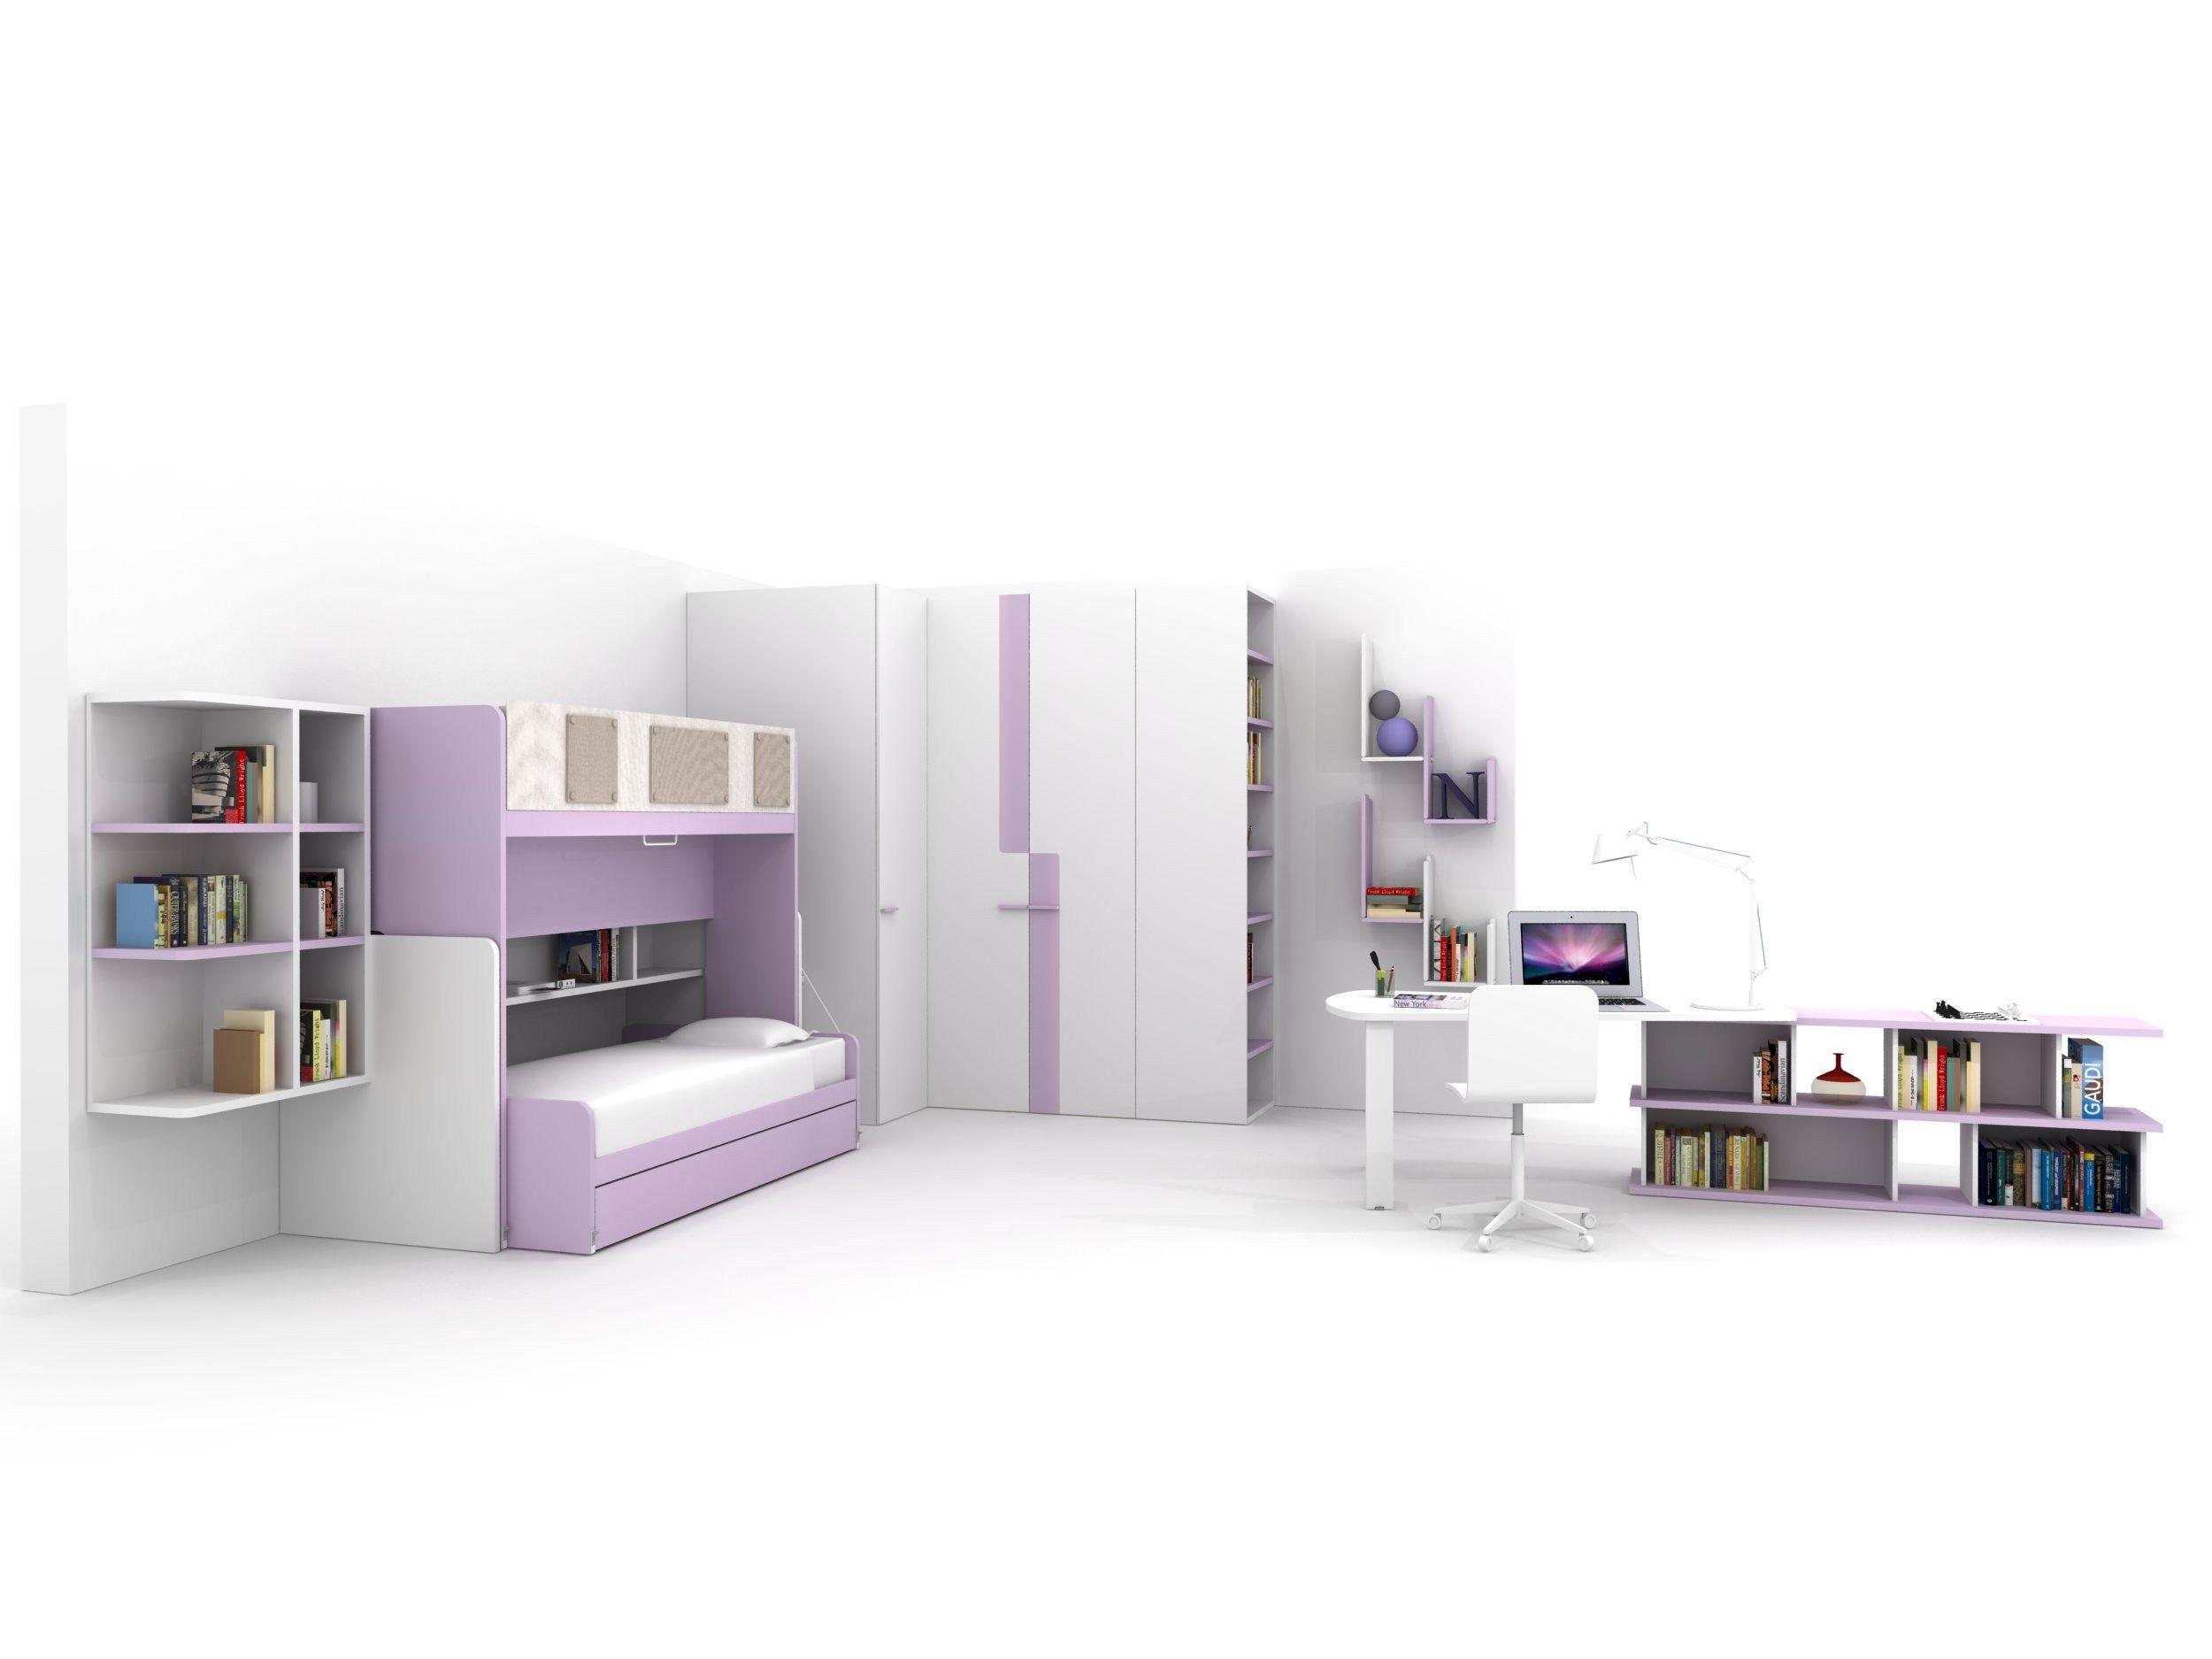 z407 schlafzimmer by zalf. Black Bedroom Furniture Sets. Home Design Ideas